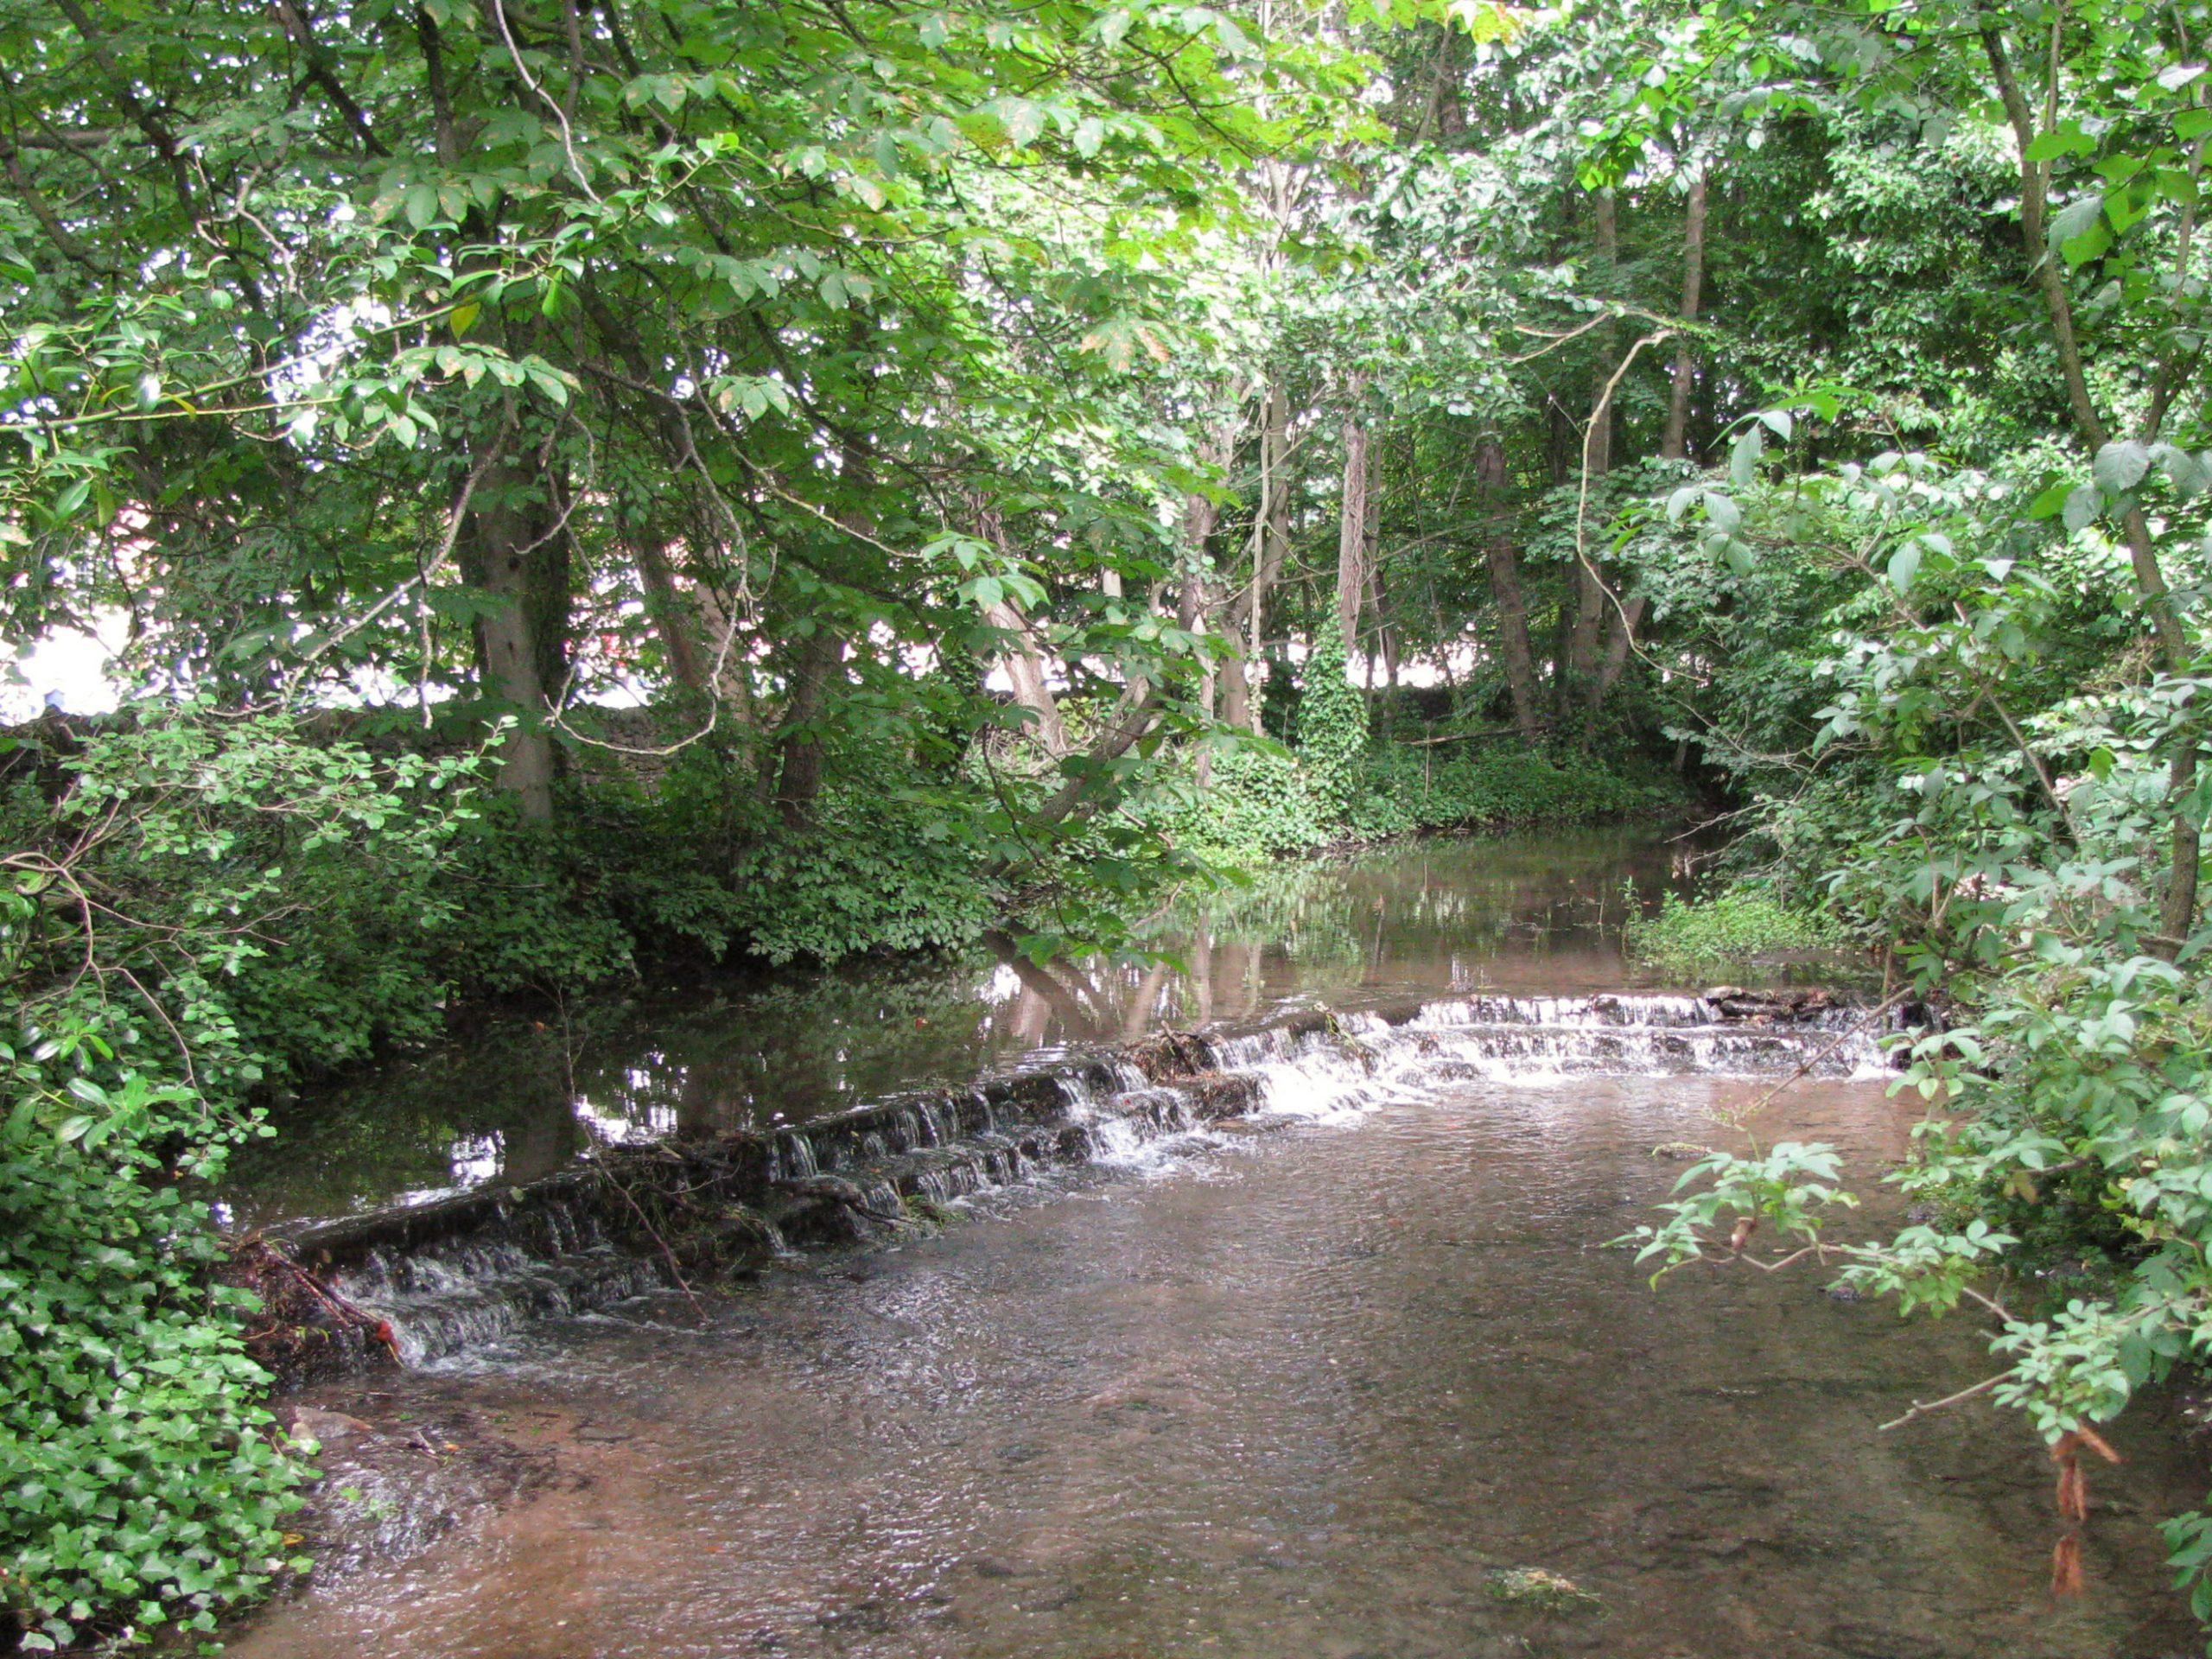 A Weekend Wander in Thornton-le-Dale